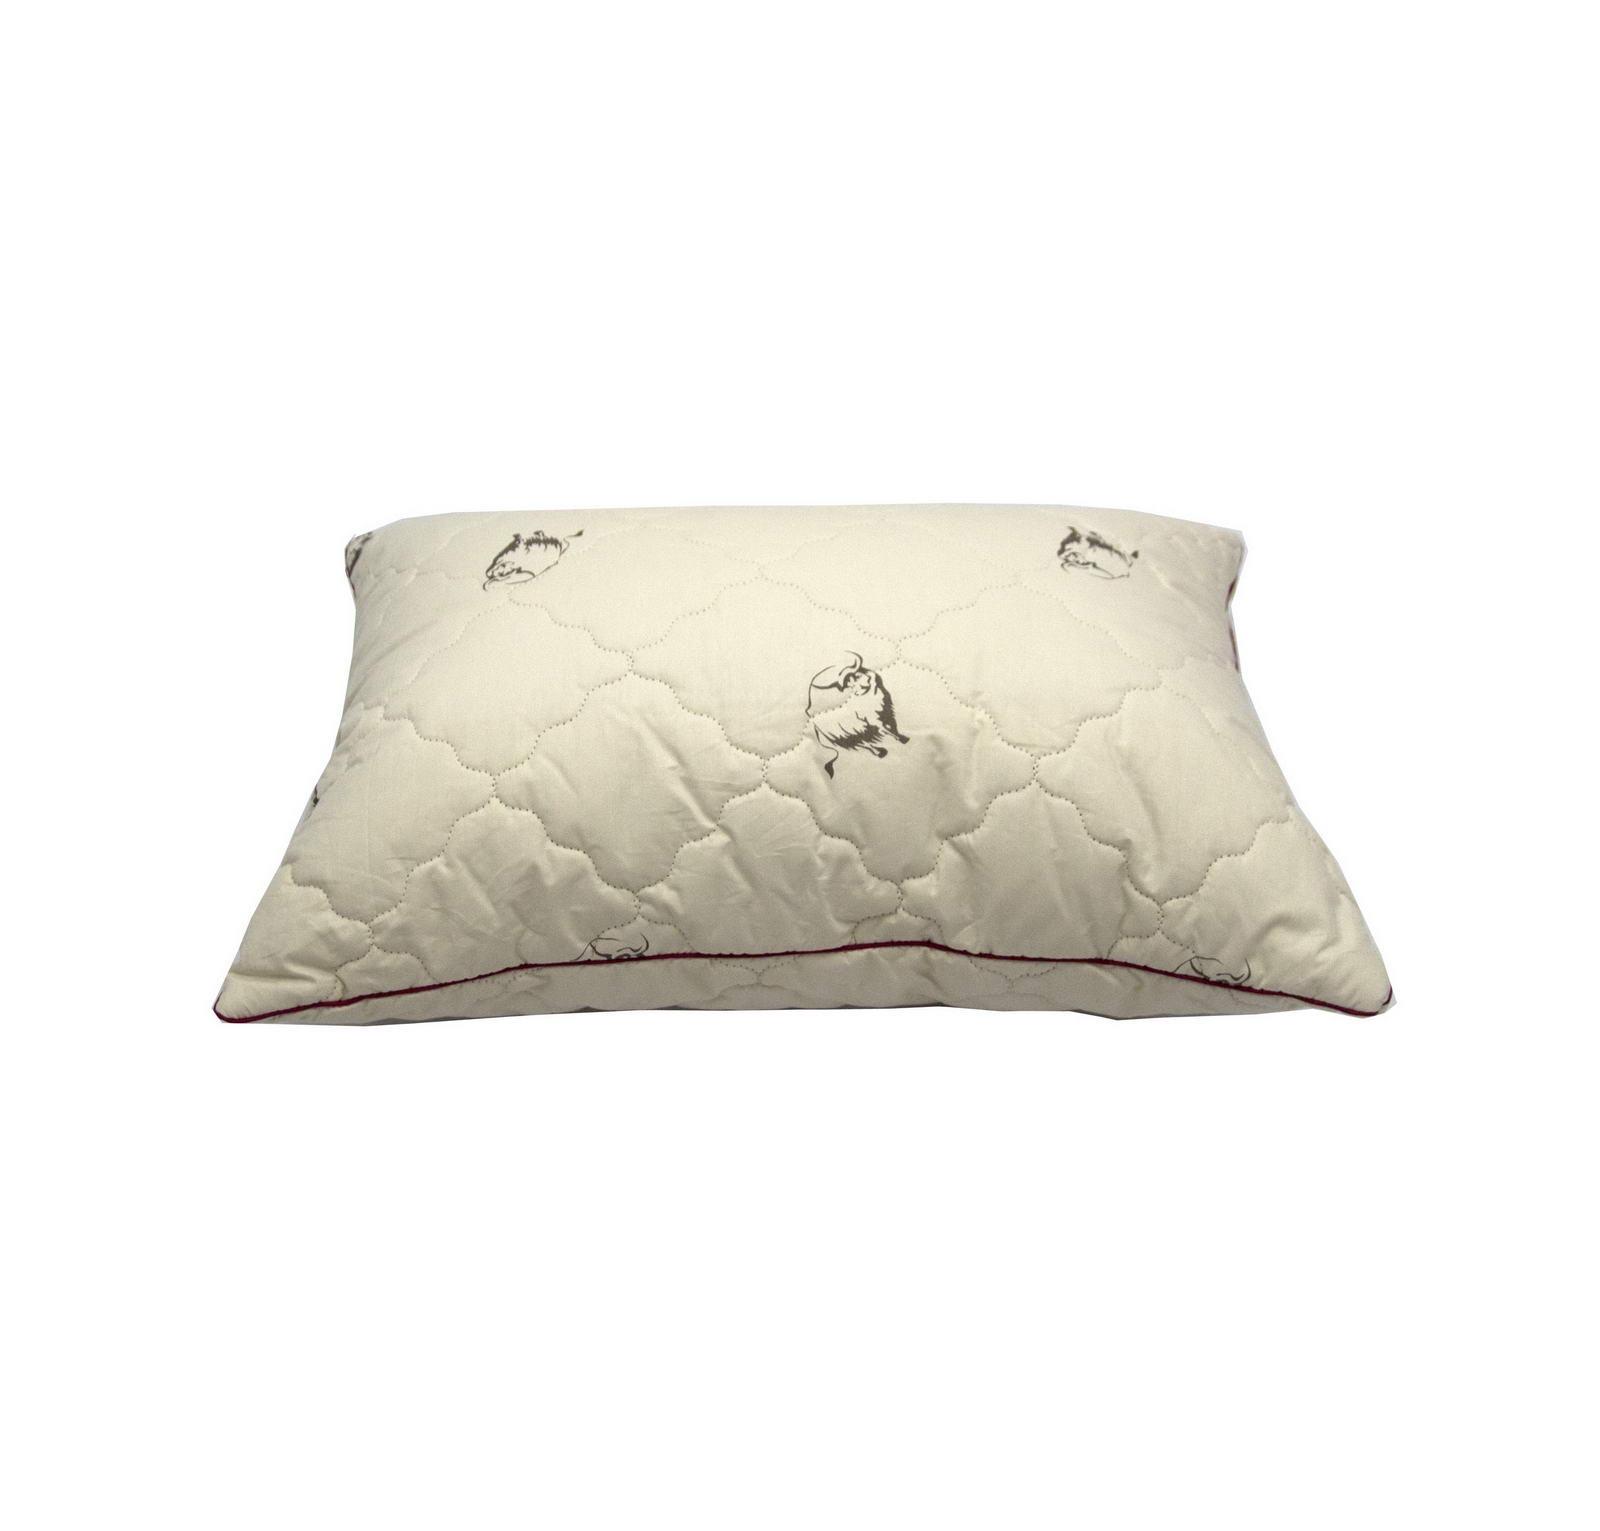 Подушка Sofi de Marko Шерсть Яка Од-Шя, 70 х 70 см одеяло славянский текстиль 140х205см шерсть яка 70%